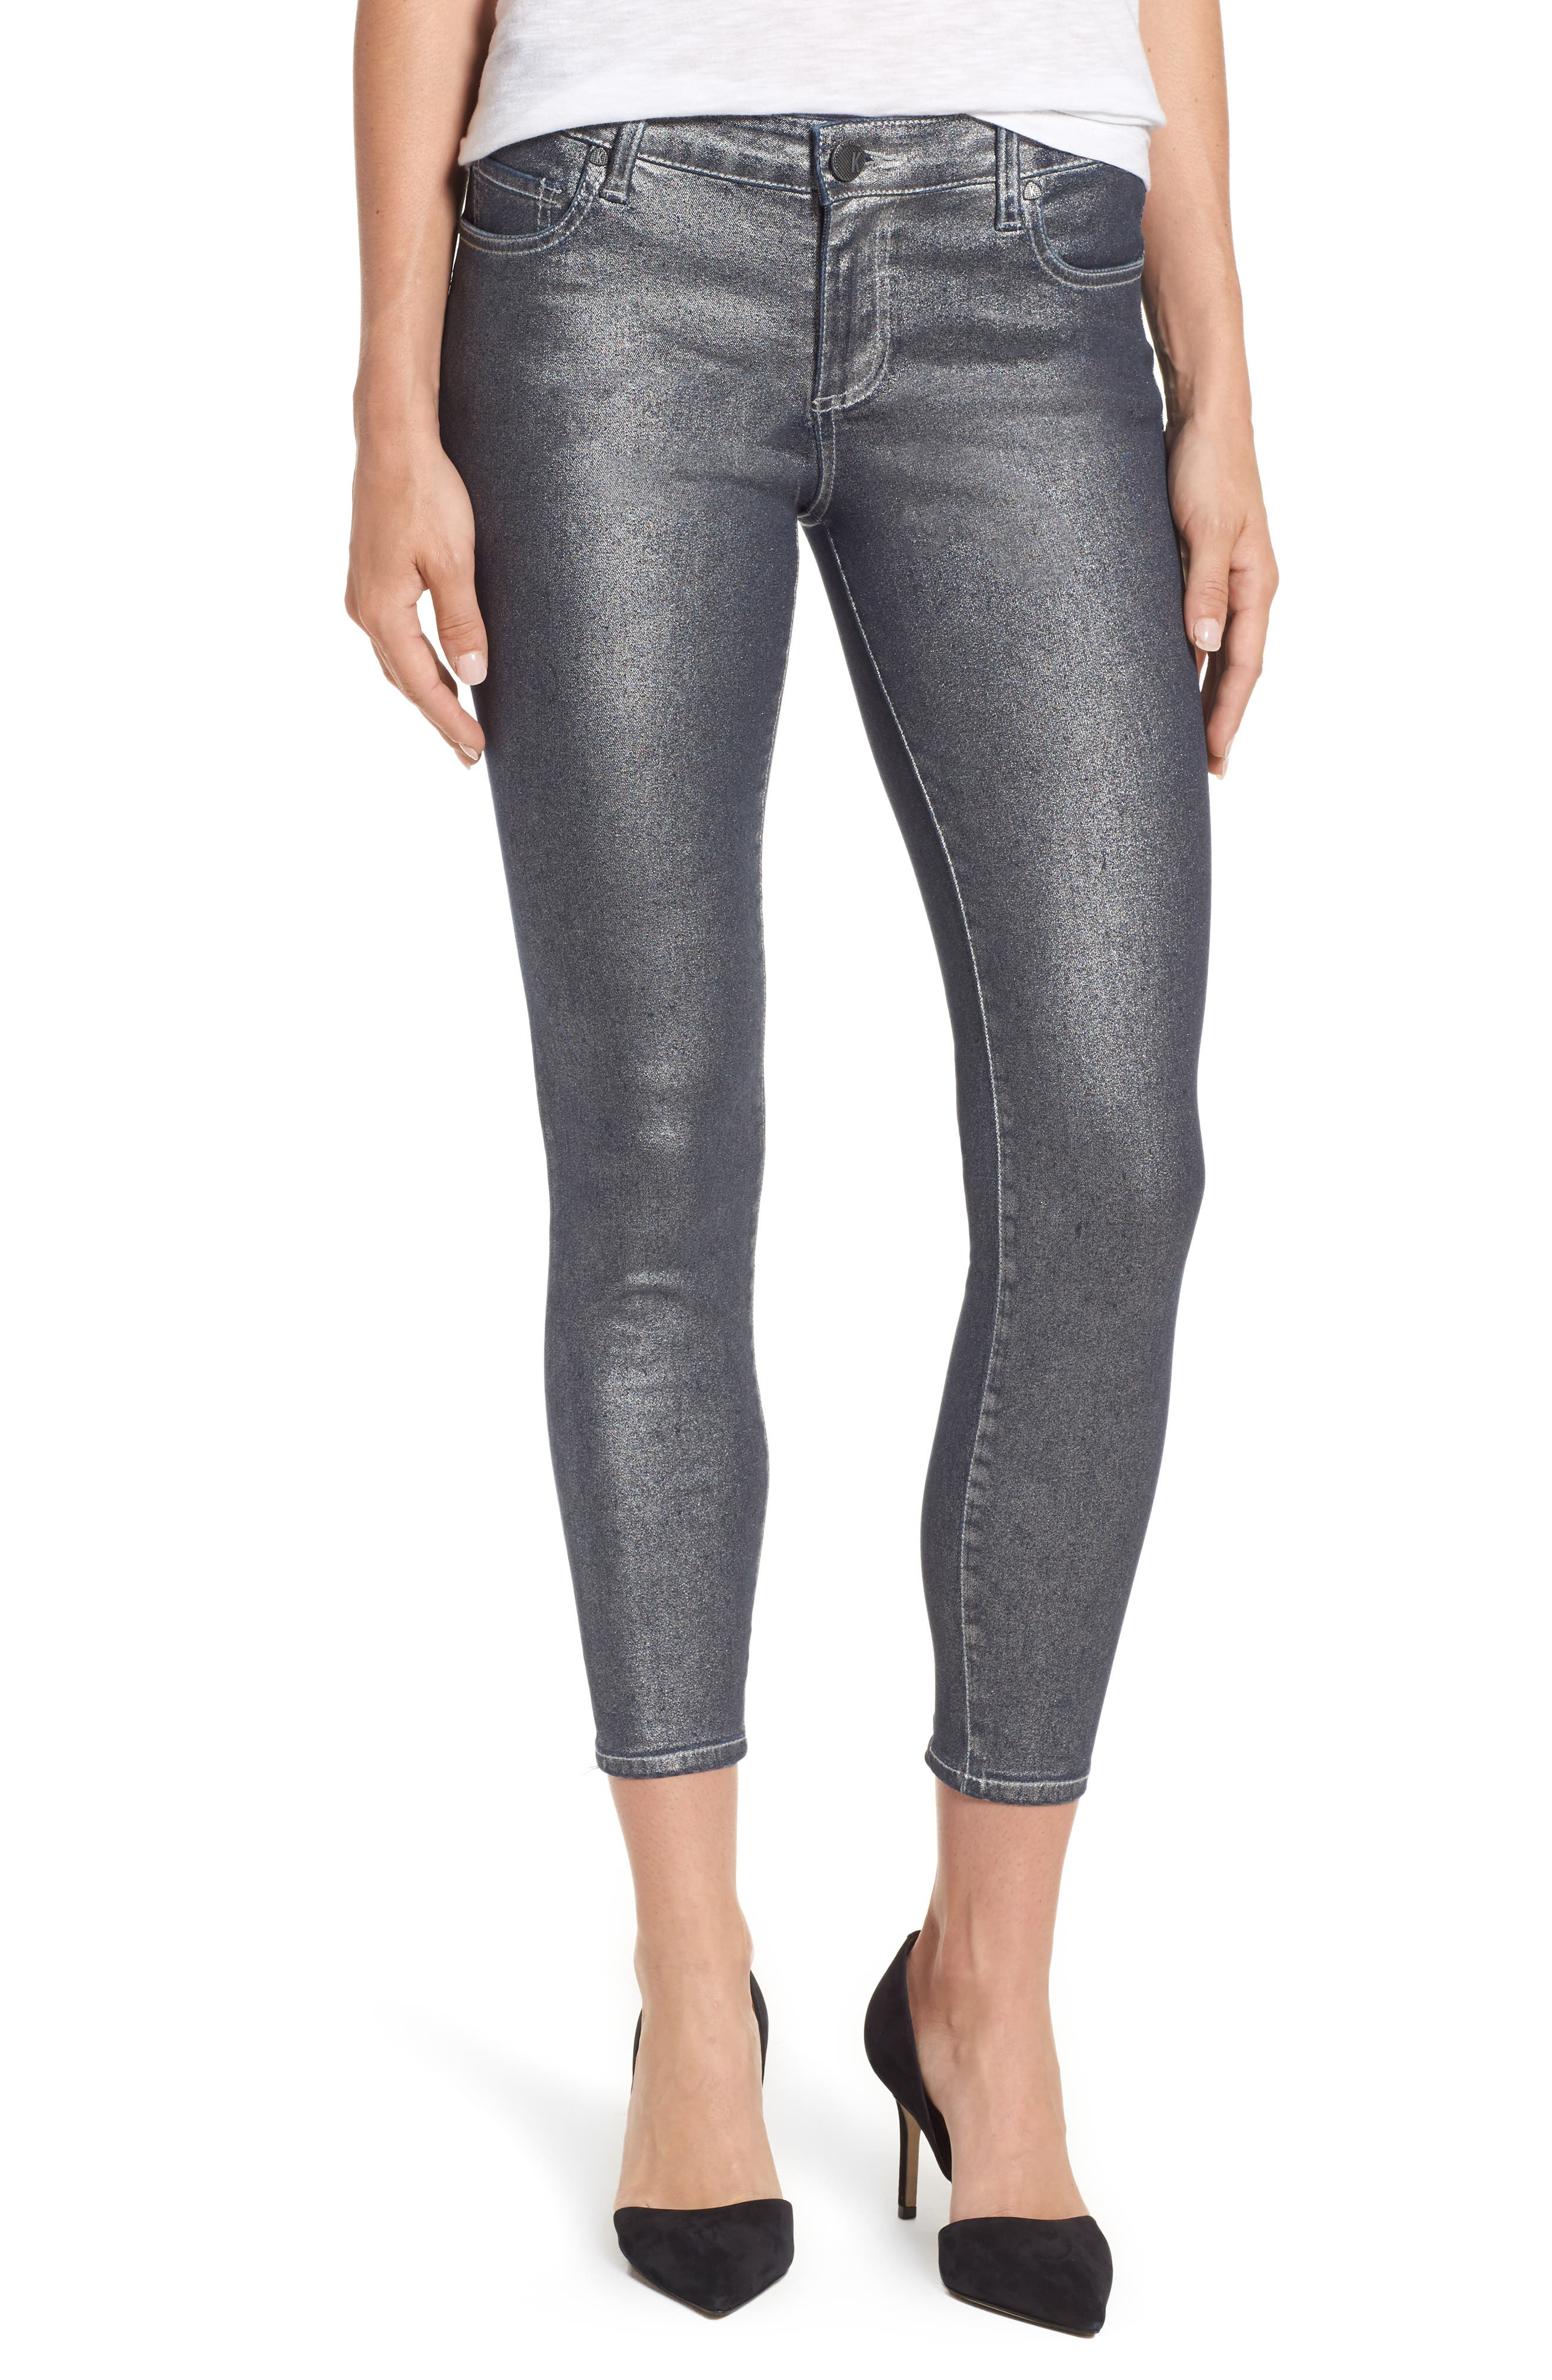 Connie Ankle Zipper Jeans,                         Main,                         color, Silver